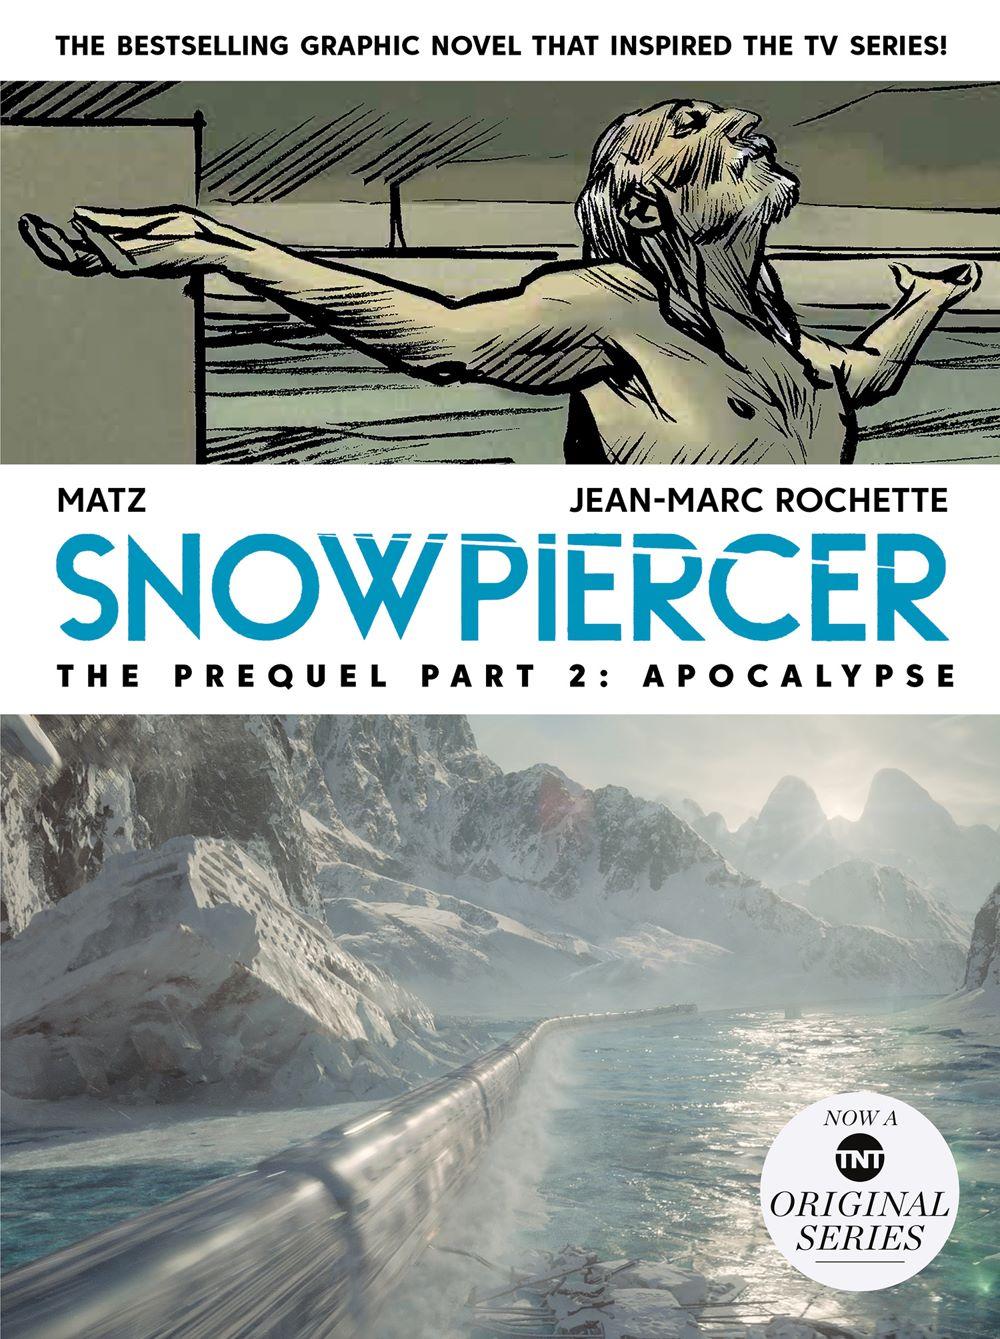 Snowpiercer-Apopcalyspe-cover ComicList Previews: SNOWPIERCER THE PREQUEL VOLUME 2 APOCALYPSE GN